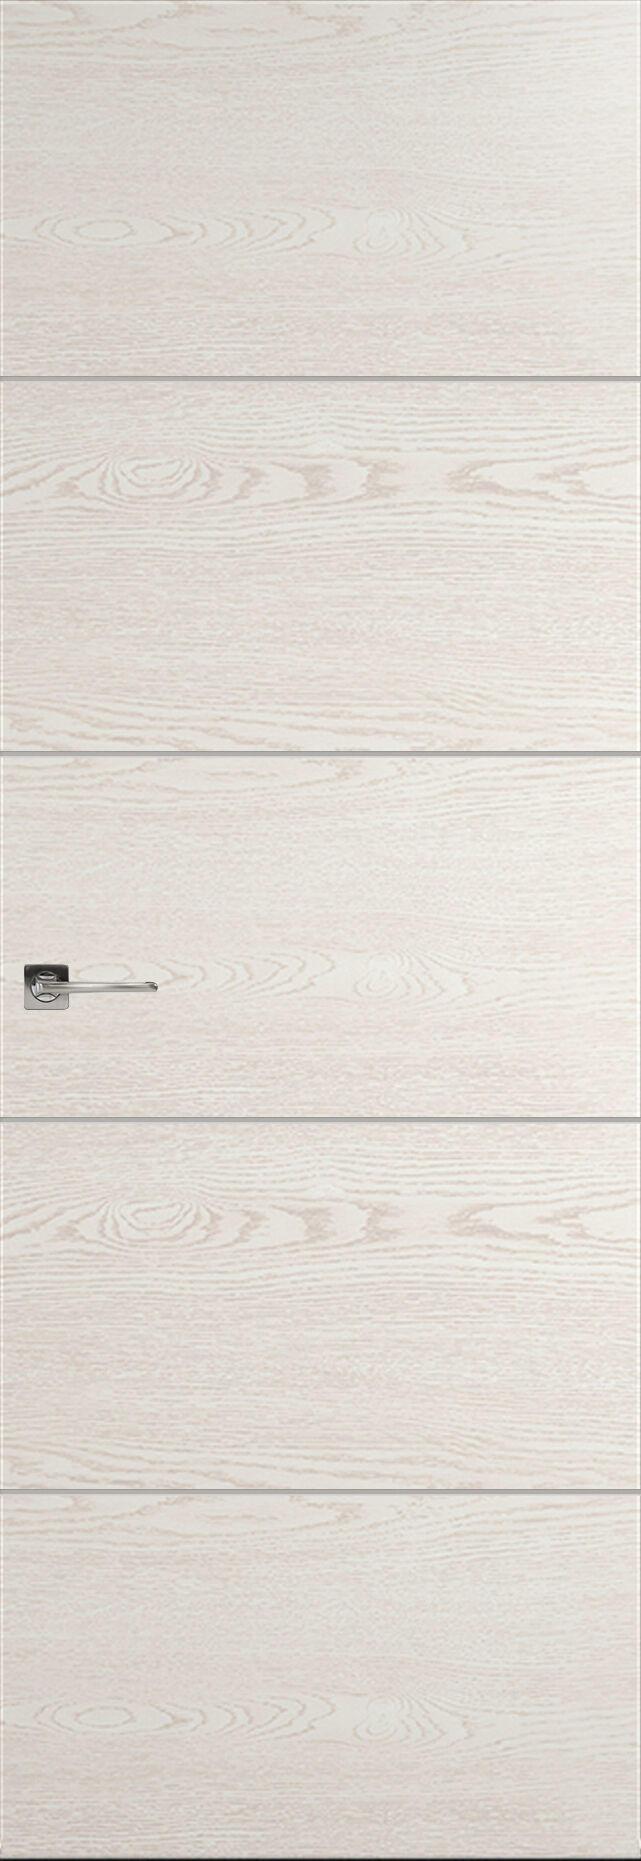 Tivoli Д-2 Невидимка цвет - Белый ясень Без стекла (ДГ)